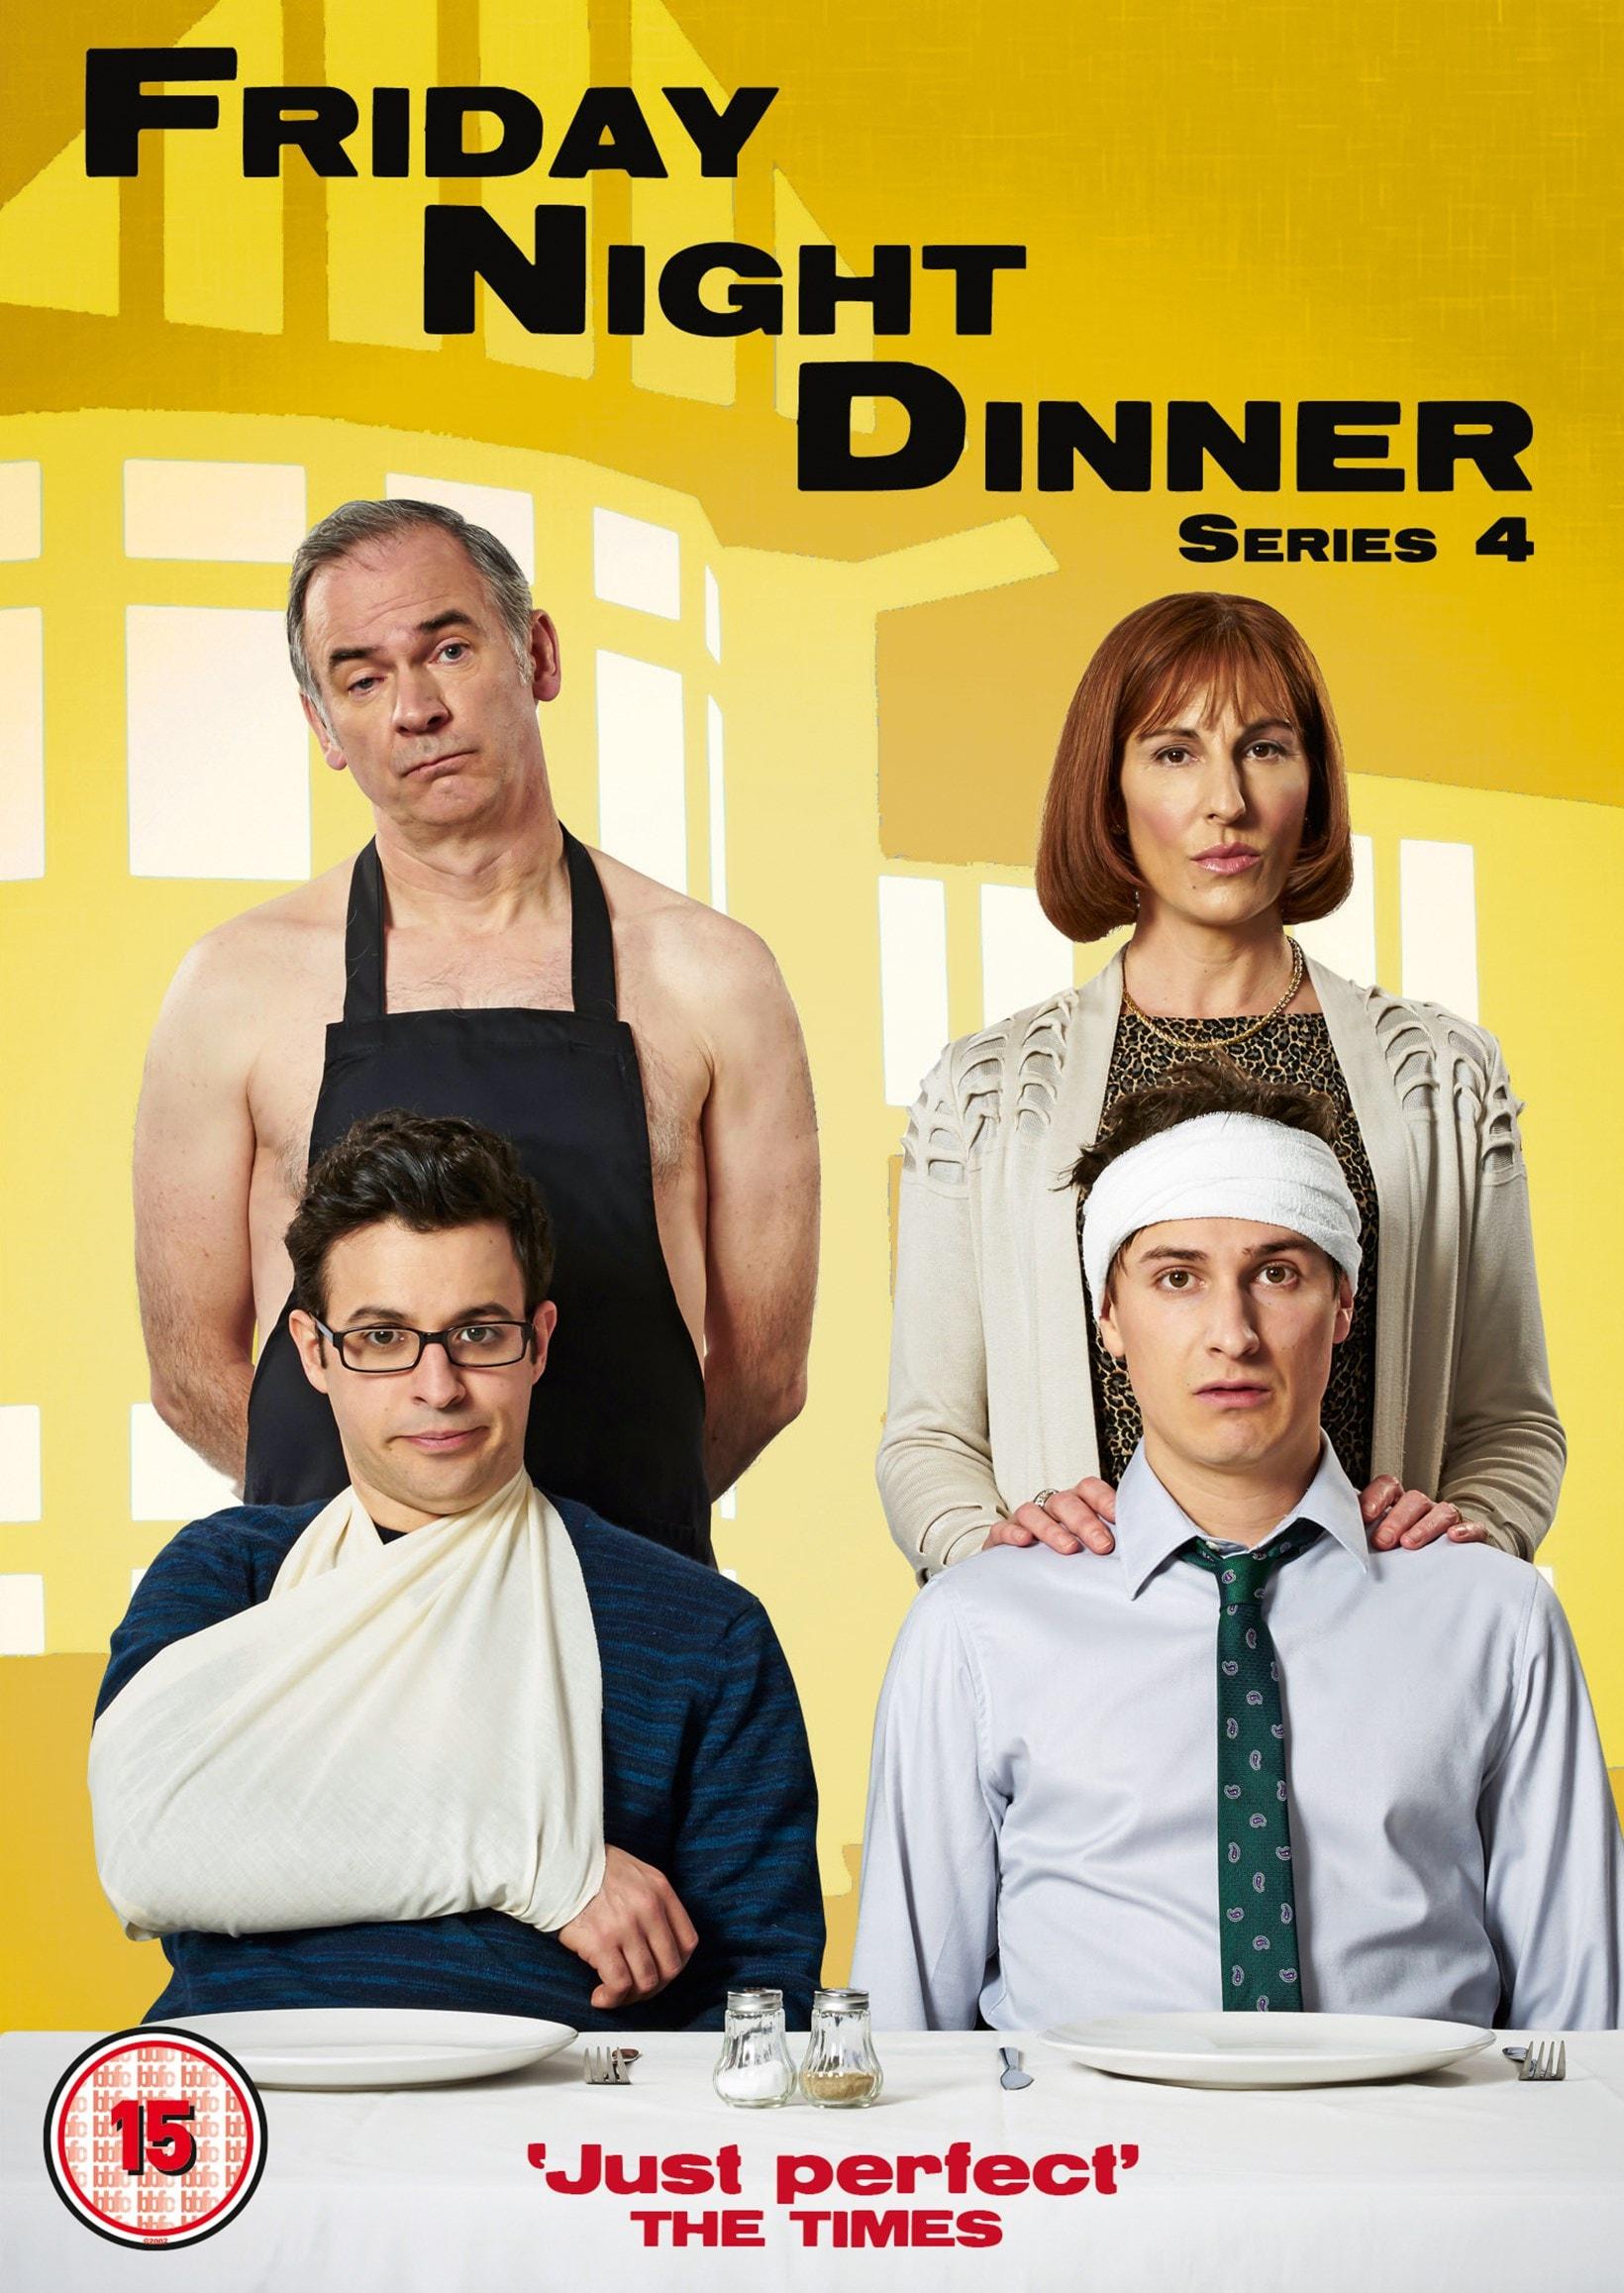 Friday Night Dinner: Series 4